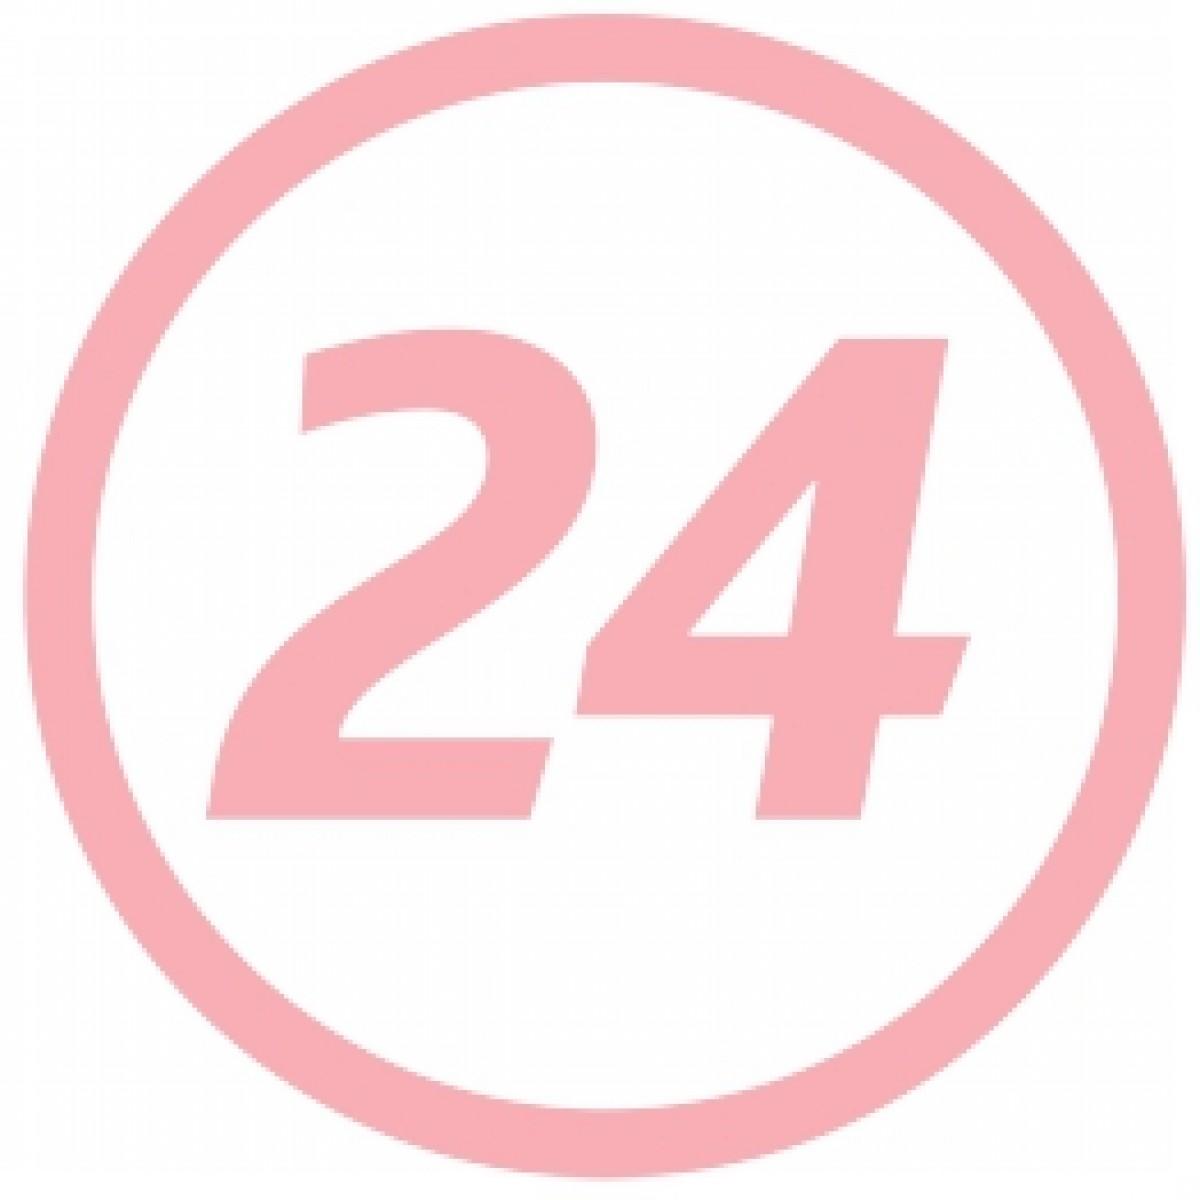 Pachet Uractiv 21 Capsule, 21buc +Servetele Umede Uractiv , Pachet, 21buc